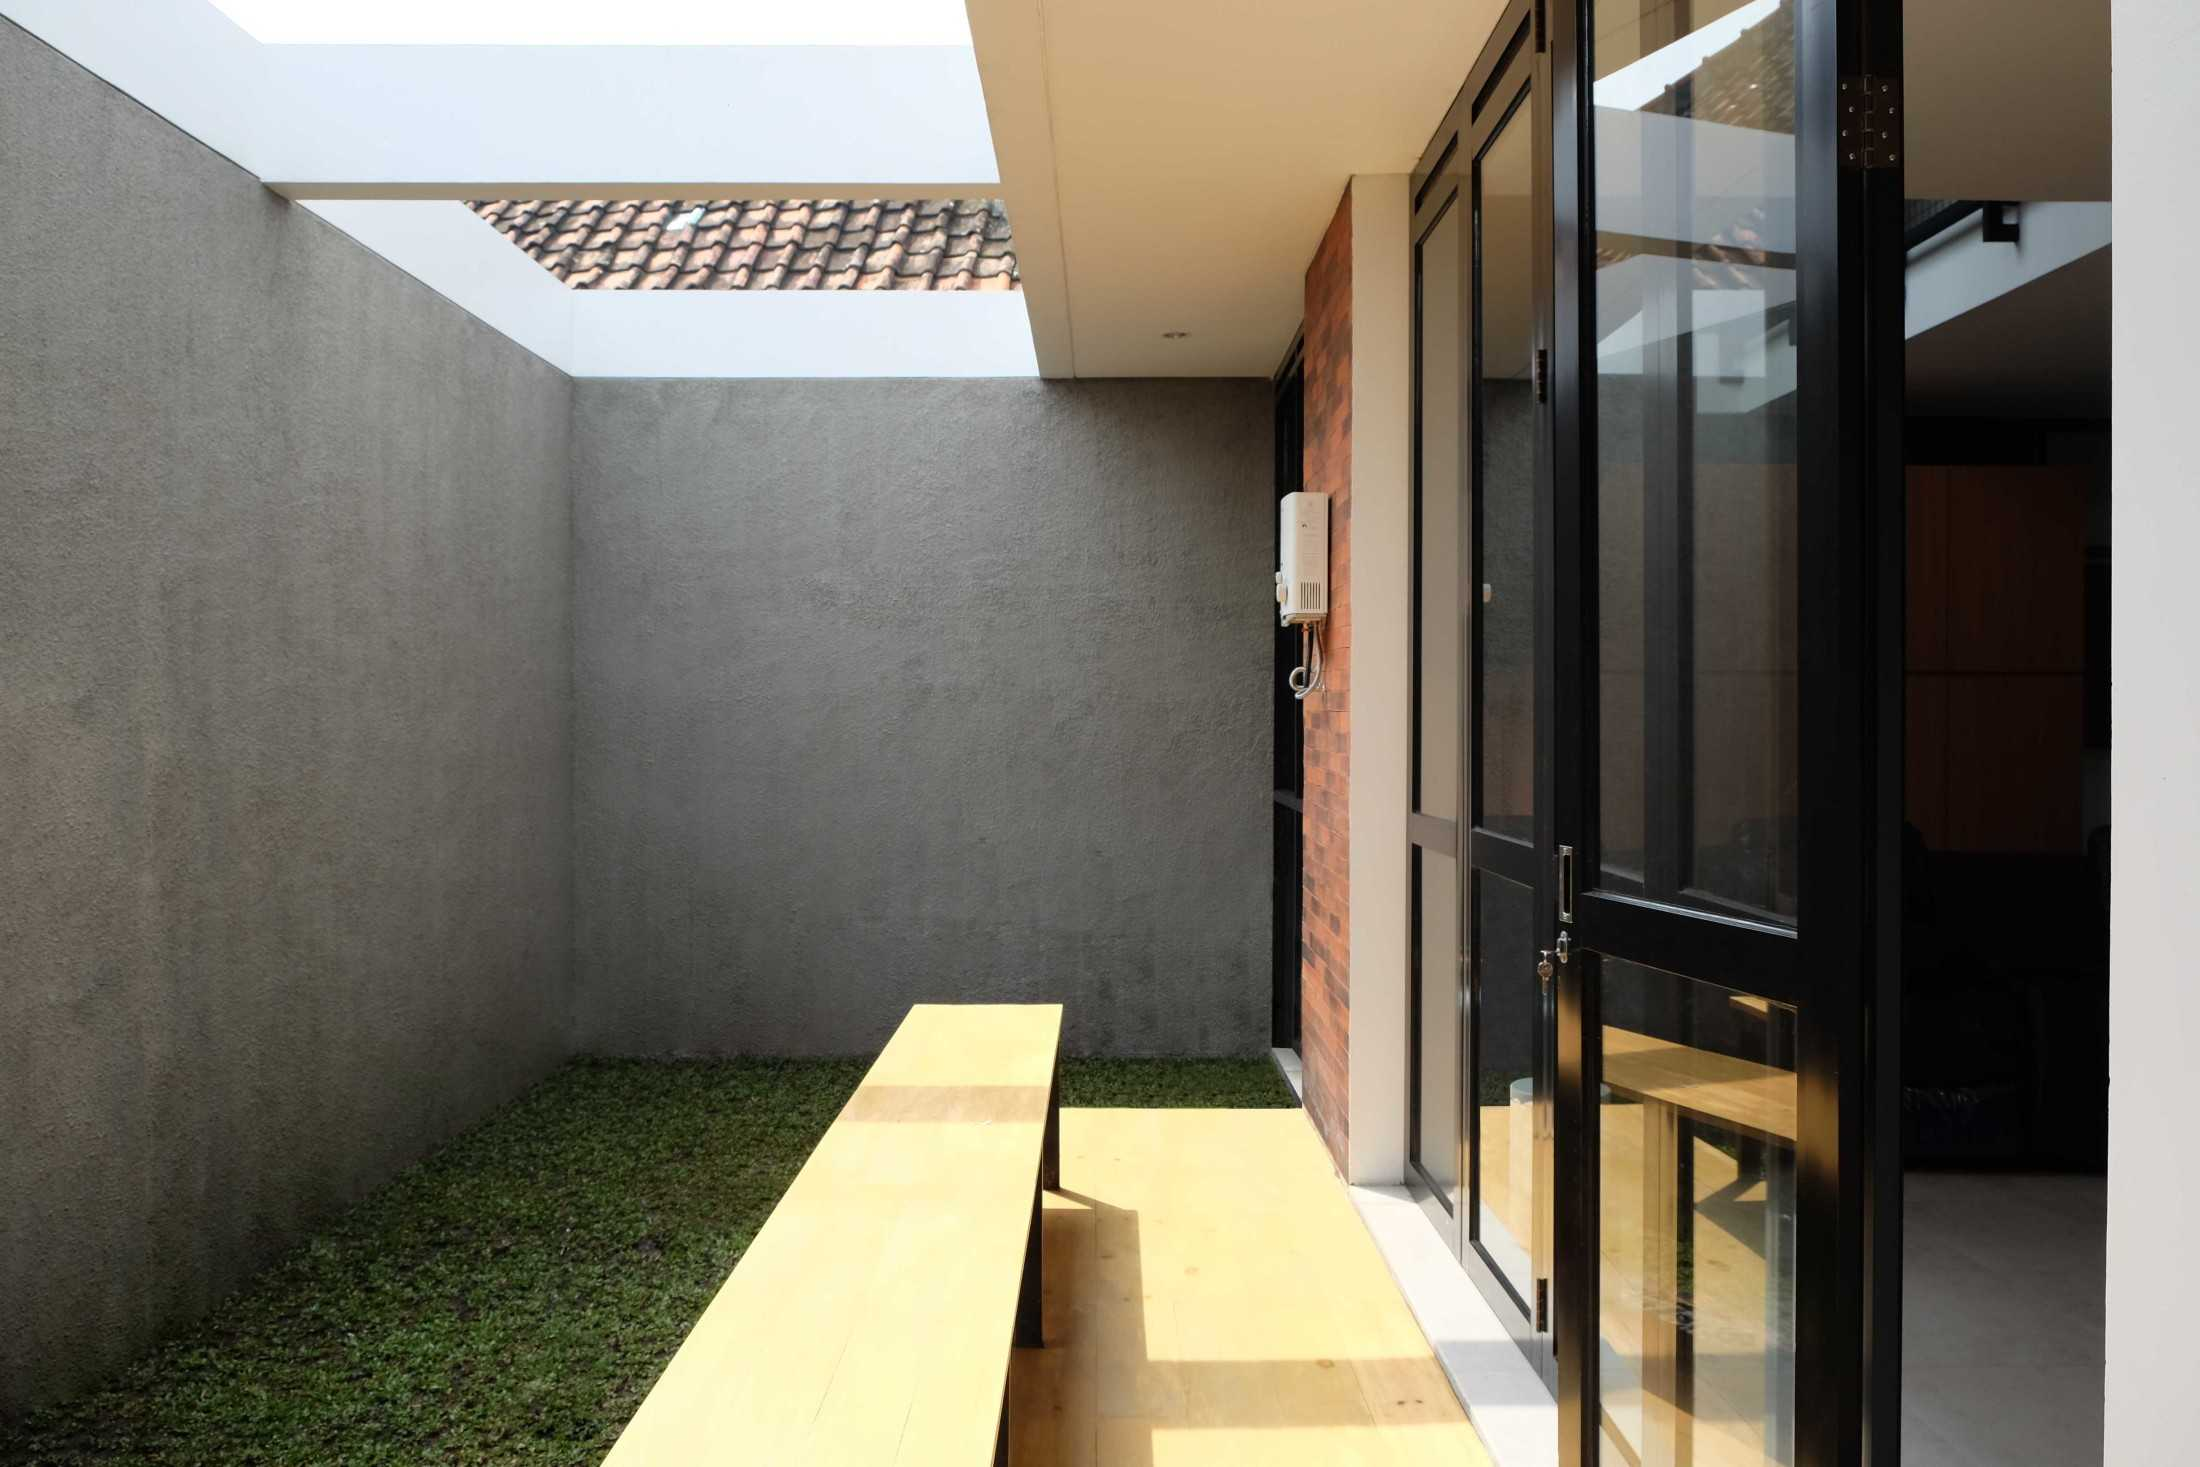 Eki Achmad Rujai Crb House Cirebon, West Java, Indonesia Cirebon, West Java, Indonesia Eki-Achmad-Rujai-Crb-House  66705